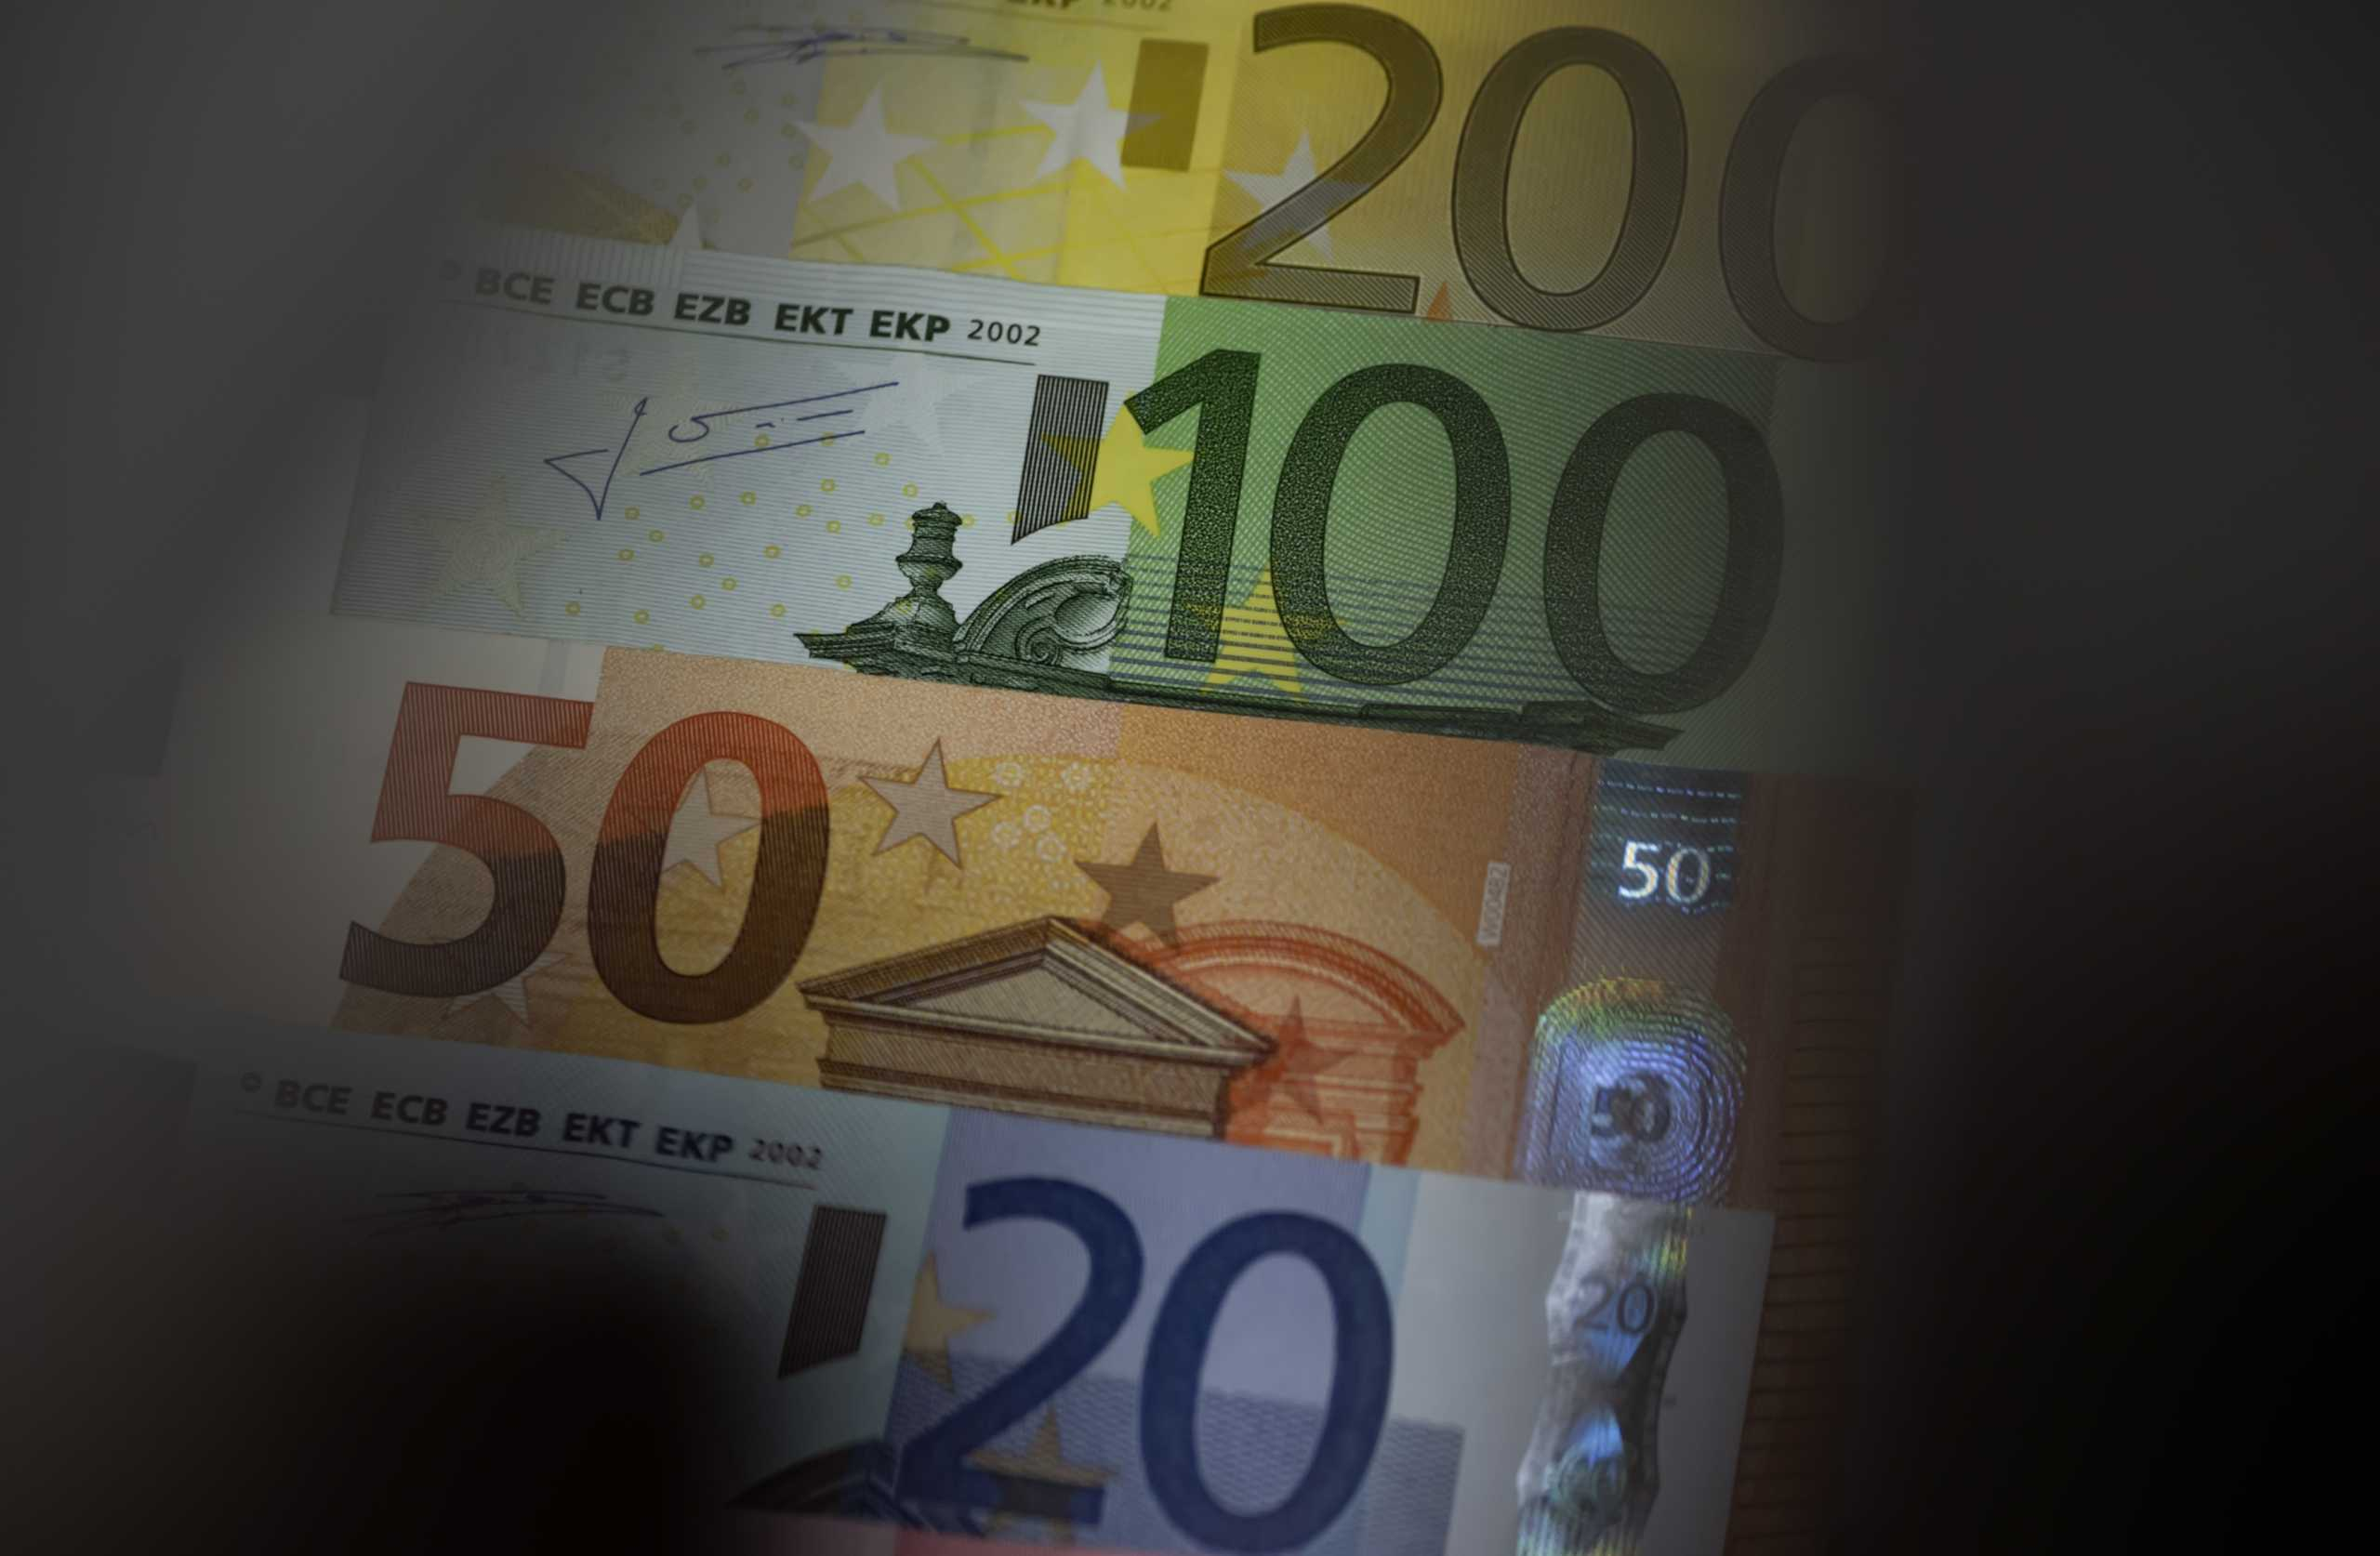 ELPEN: Εγκρίθηκε νέα επένδυση ύψους 51 εκατομμυρίων ευρώ από τη Διϋπουργική Επιτροπή Στρατηγικών Επενδύσεων